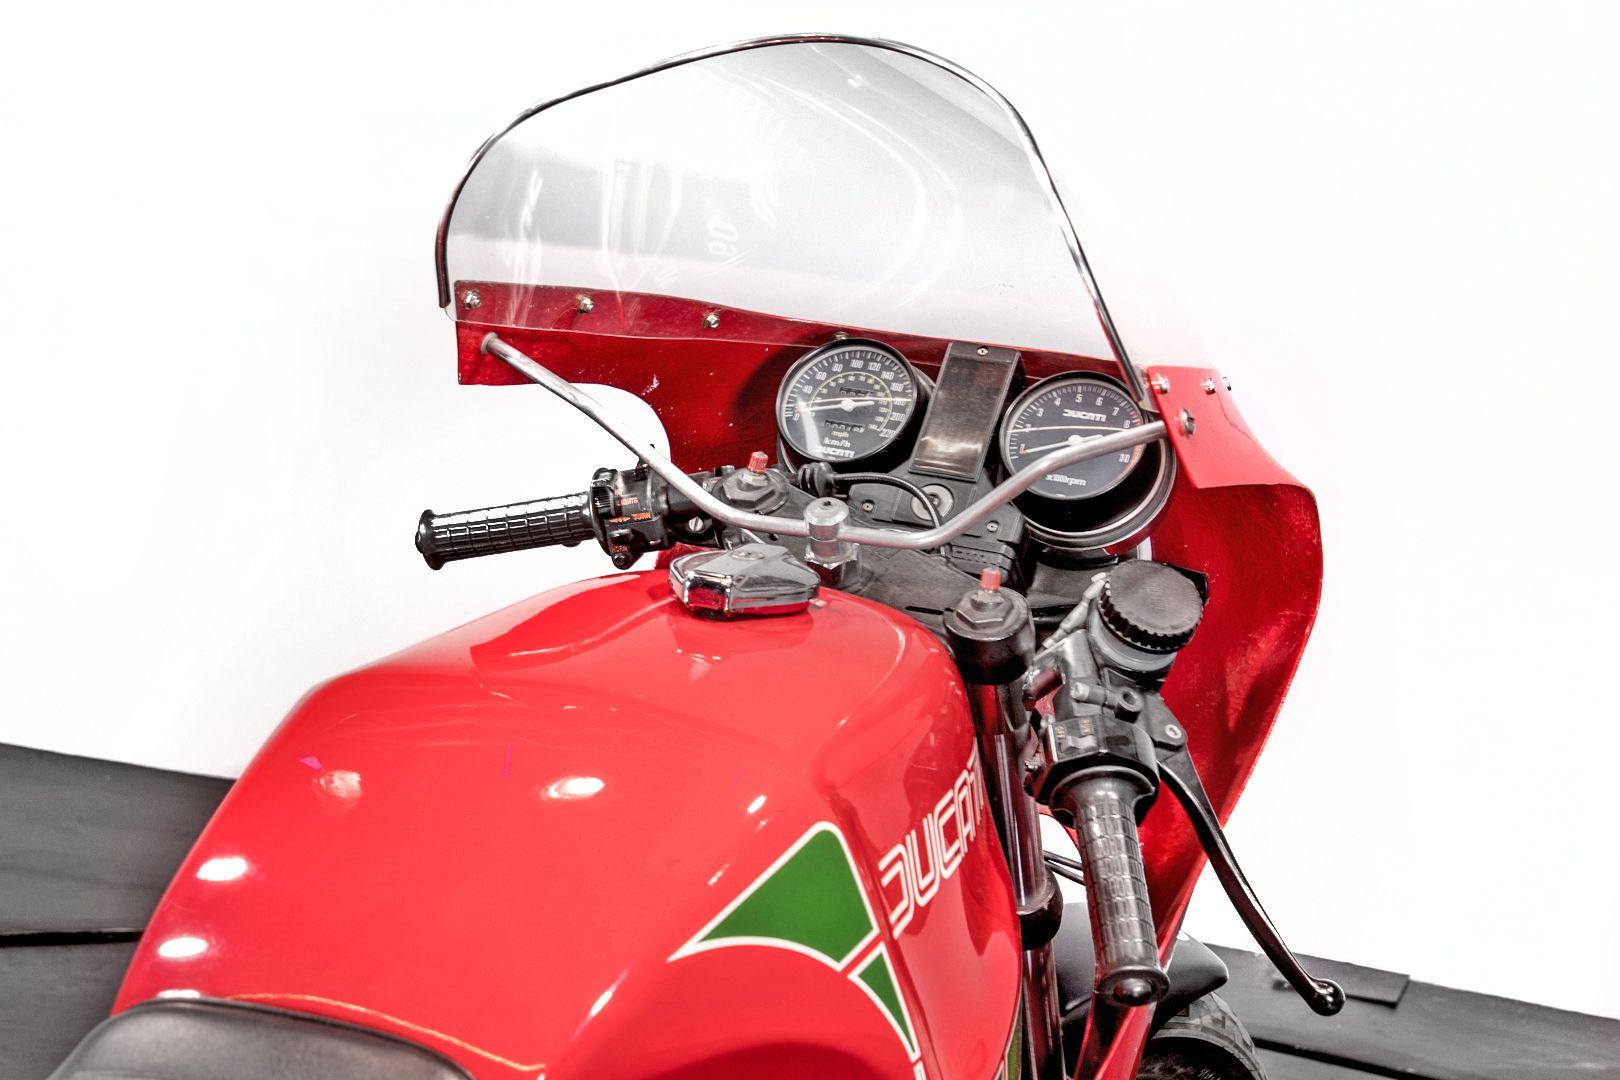 1984 Ducati 900 Mike Hailwood Replica 81566